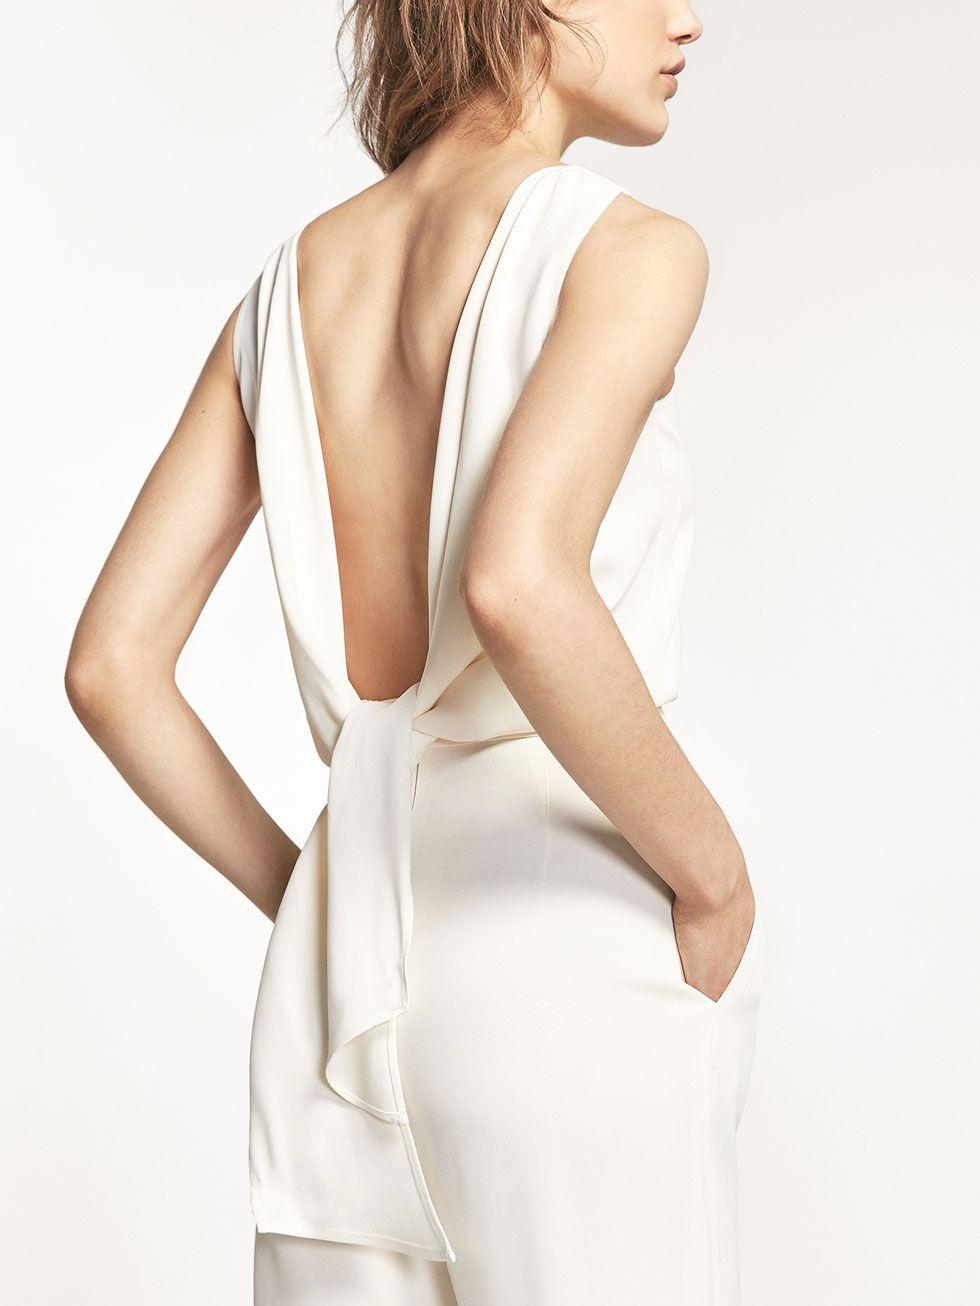 combinaison blanche n ud pour femmes robes et. Black Bedroom Furniture Sets. Home Design Ideas